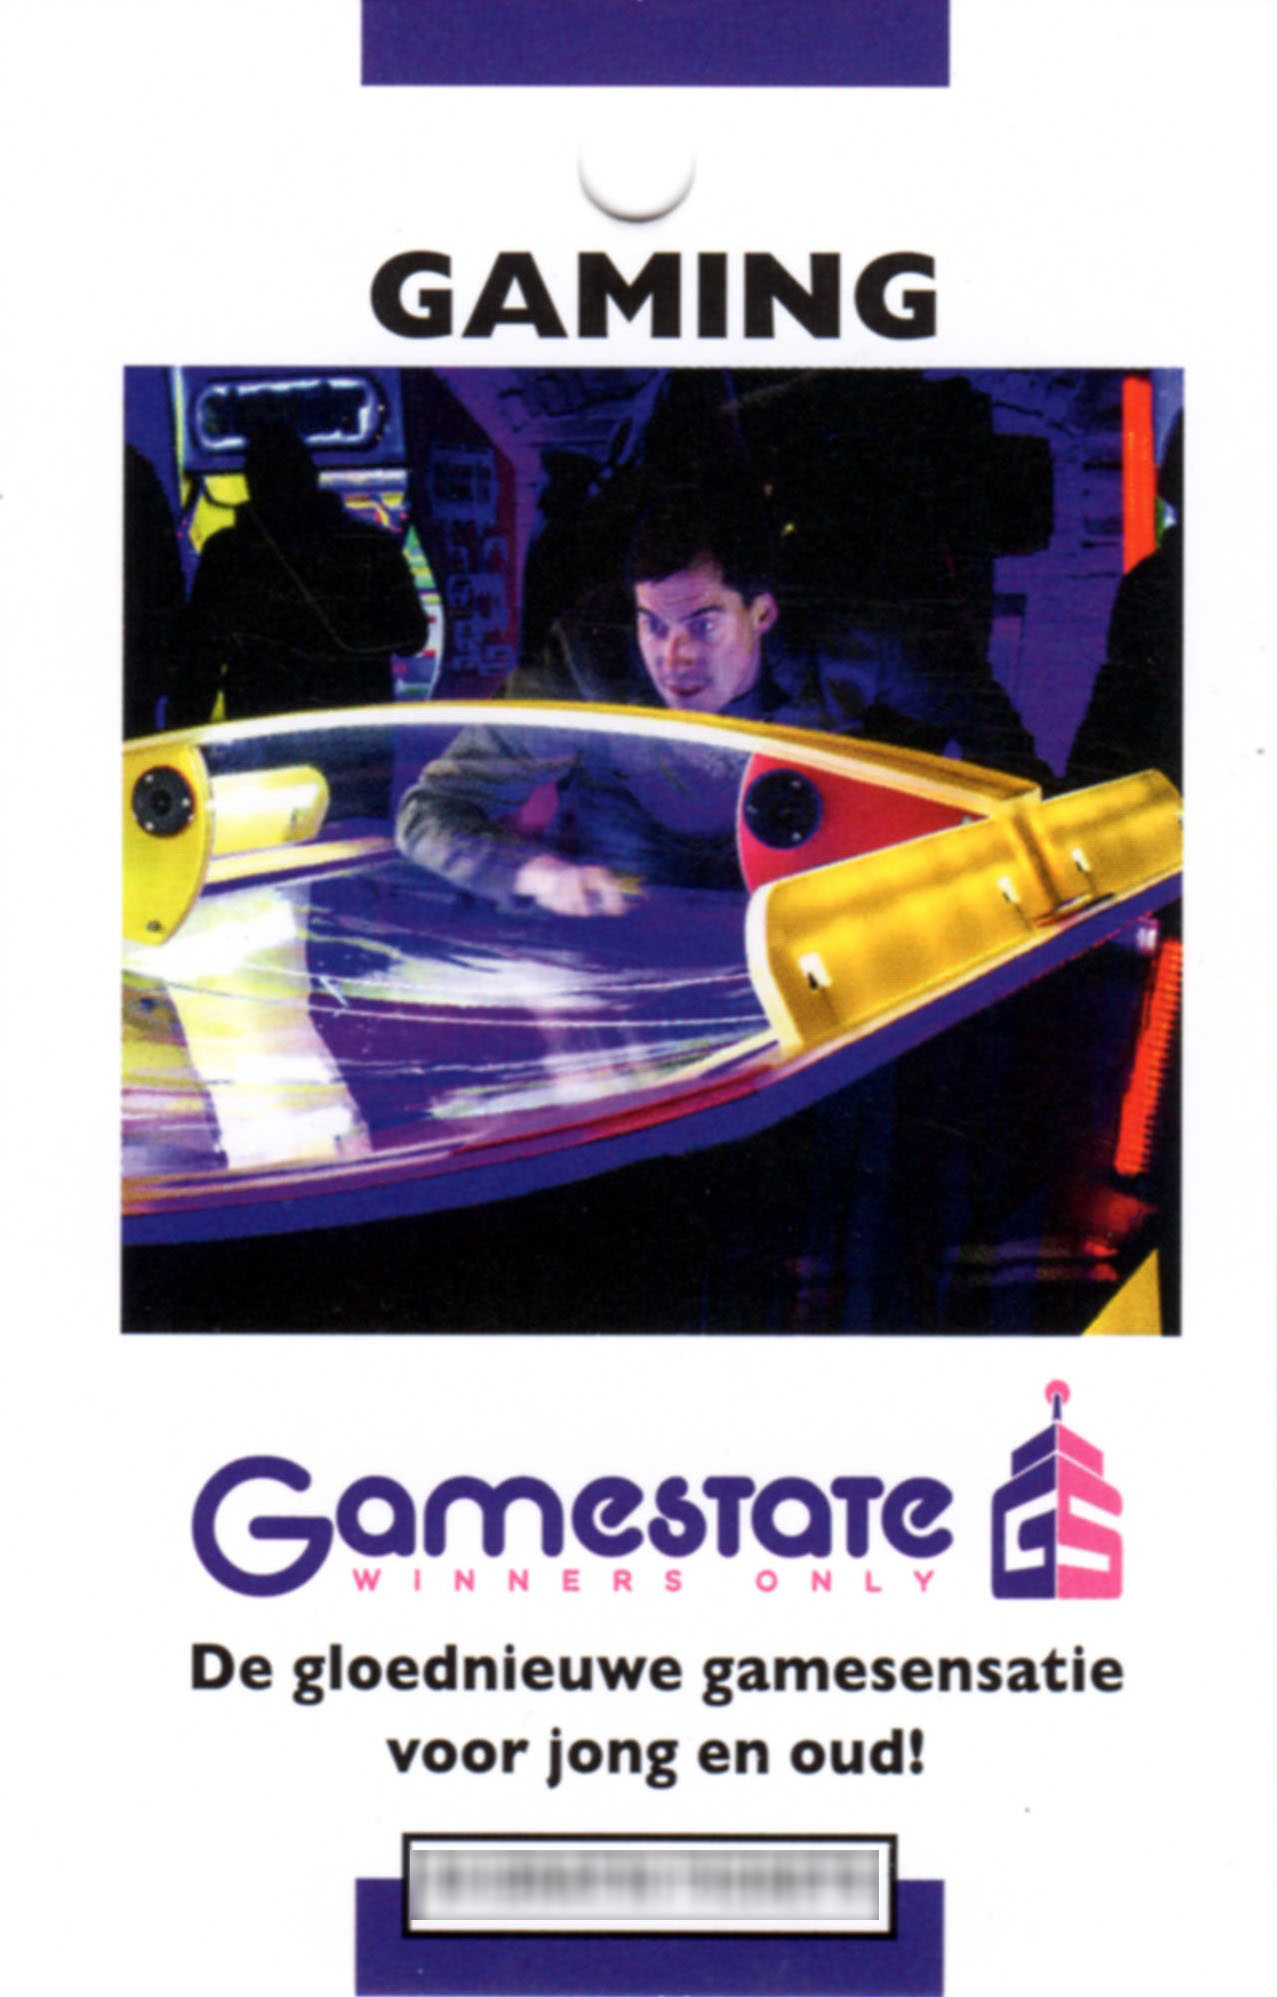 Gamestate